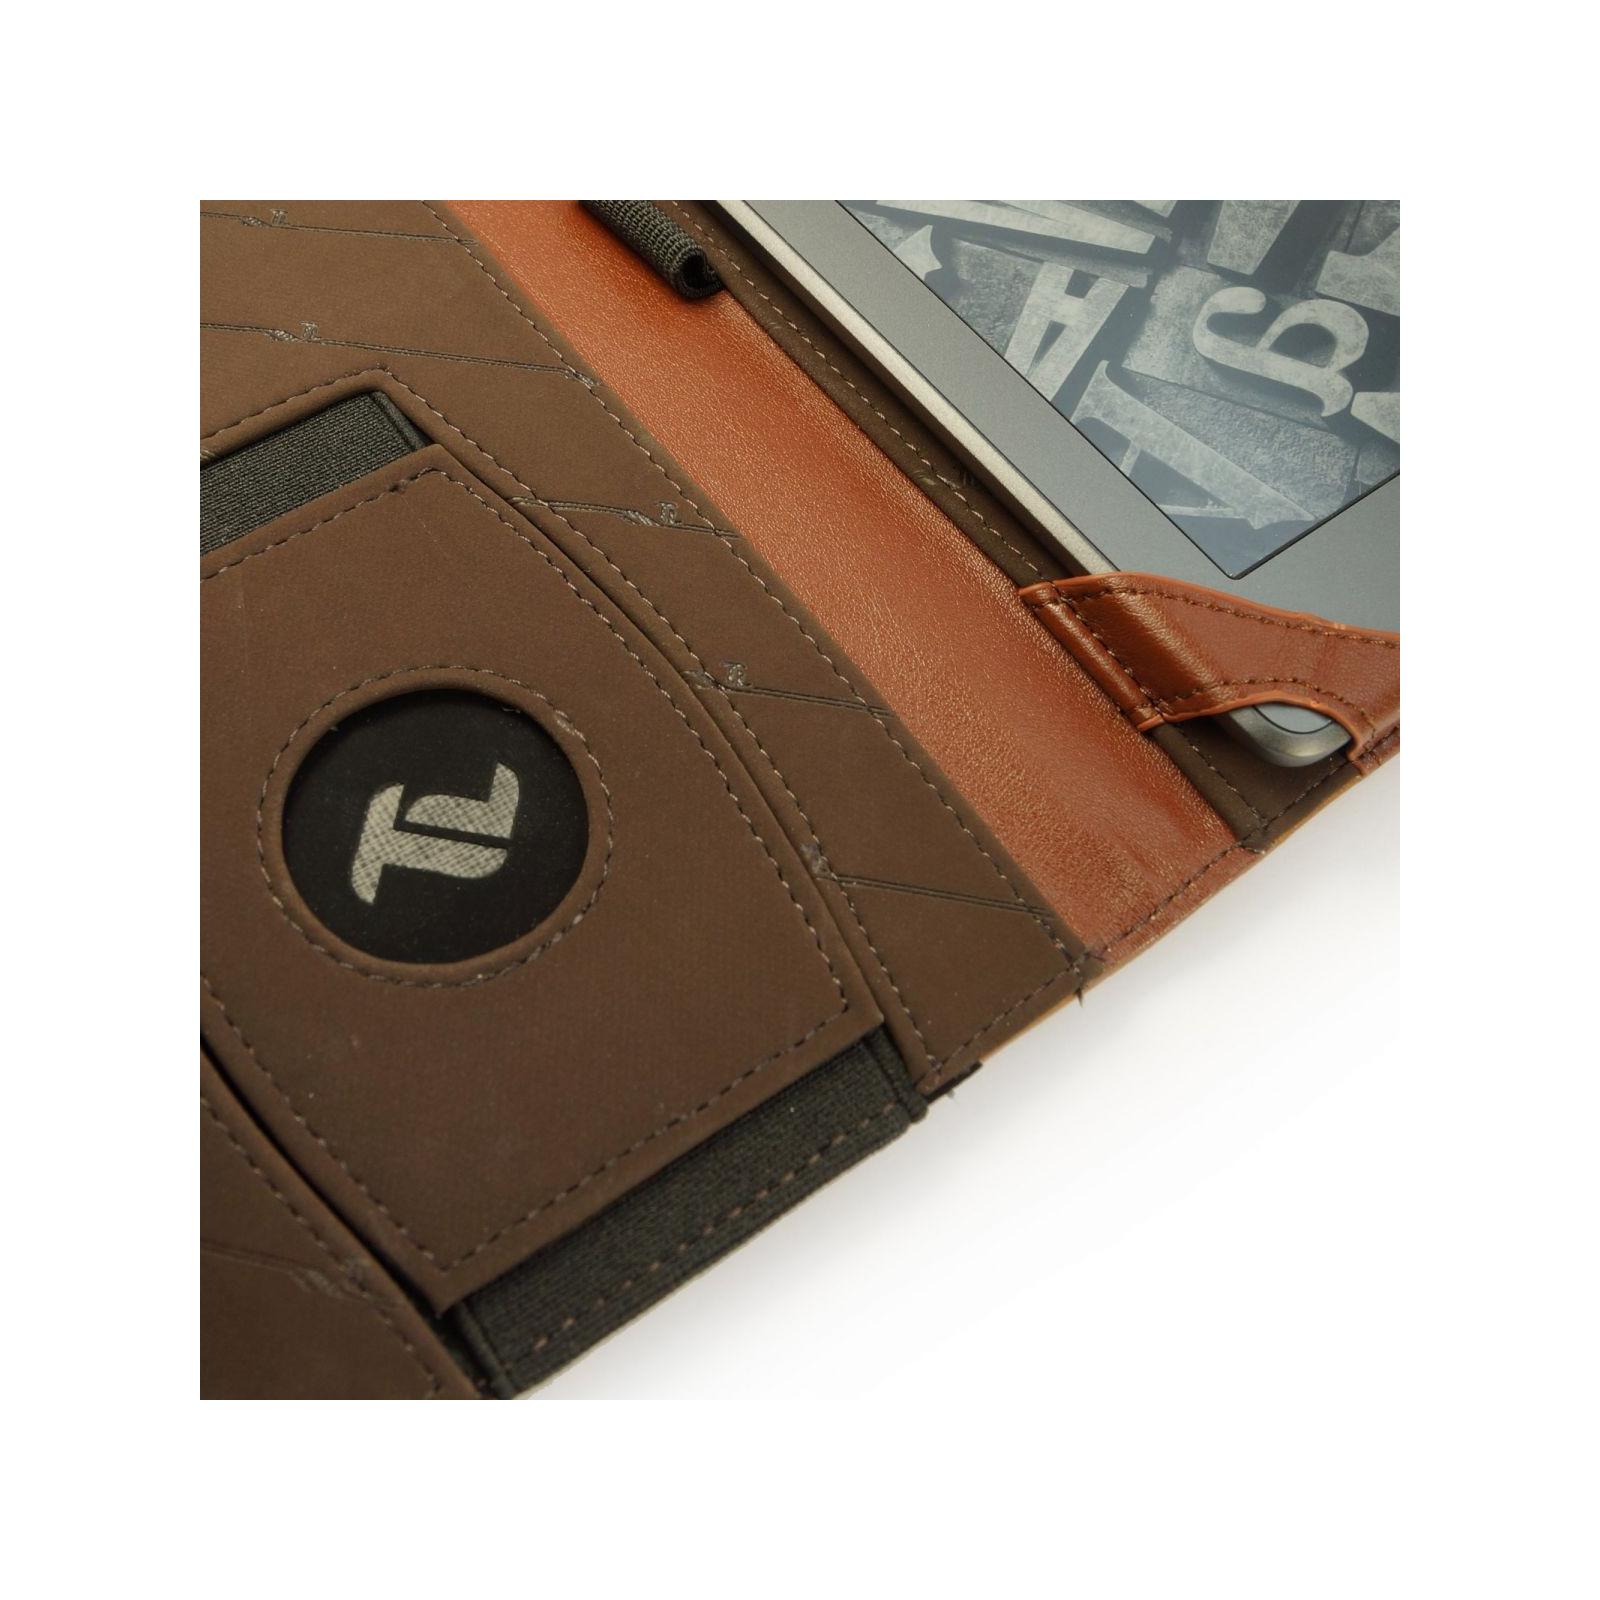 Чехол для электронной книги Tuff-Luv 6 Embrace Plus Leather Vintage Brown (A10_41) изображение 7